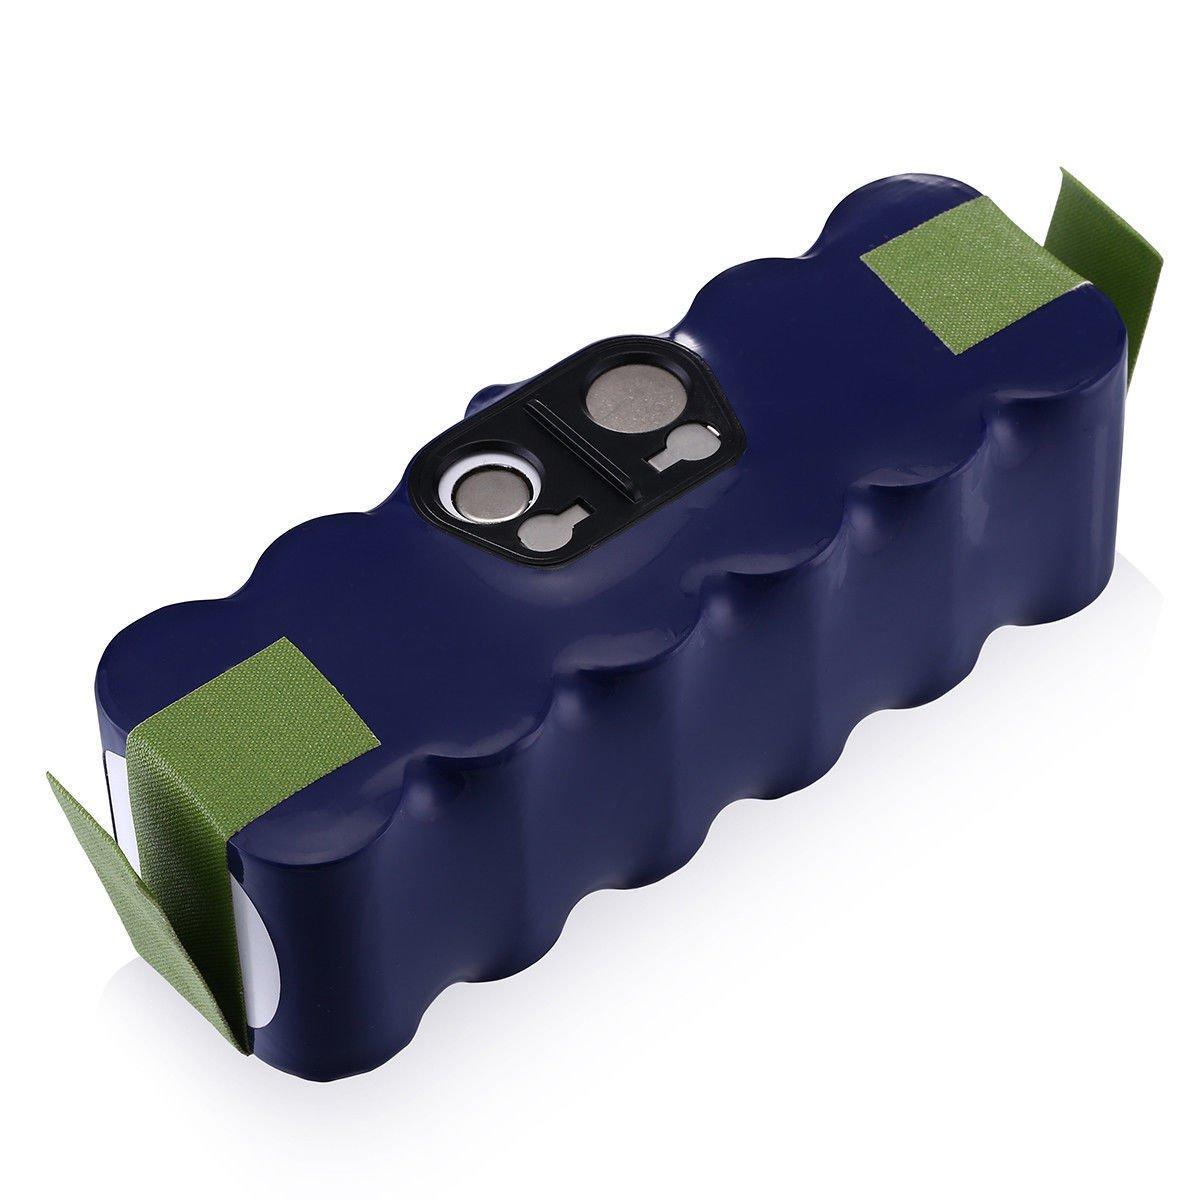 3500mAh NI-MH Vacuum Battery For iRobot Roomba 500 510 530 570 580 550 552 560 562